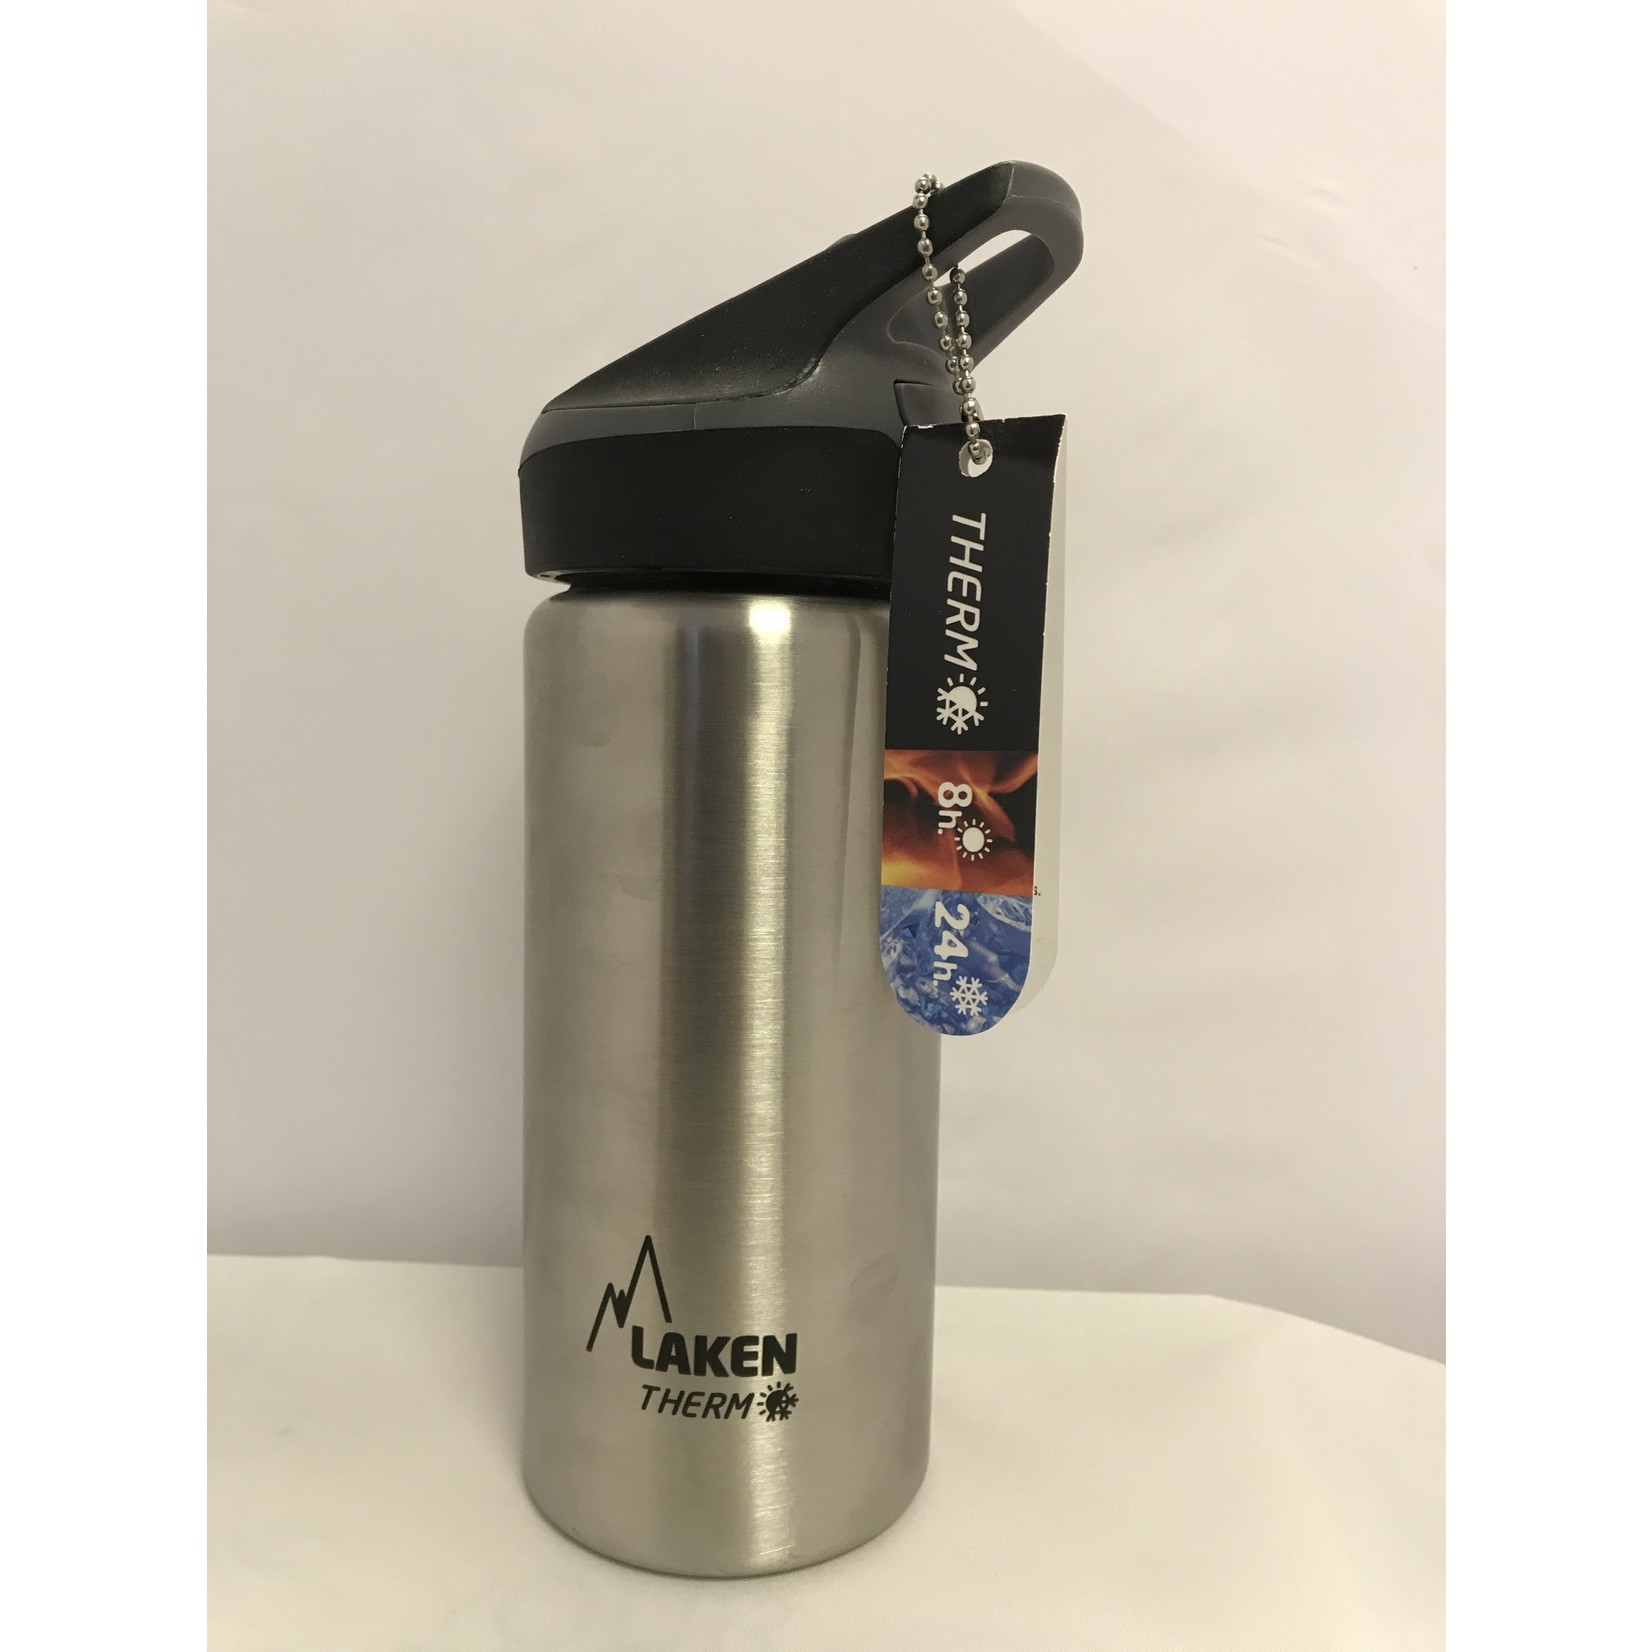 Laken Laken S/S Thermo Bottle-Silver 500Ml